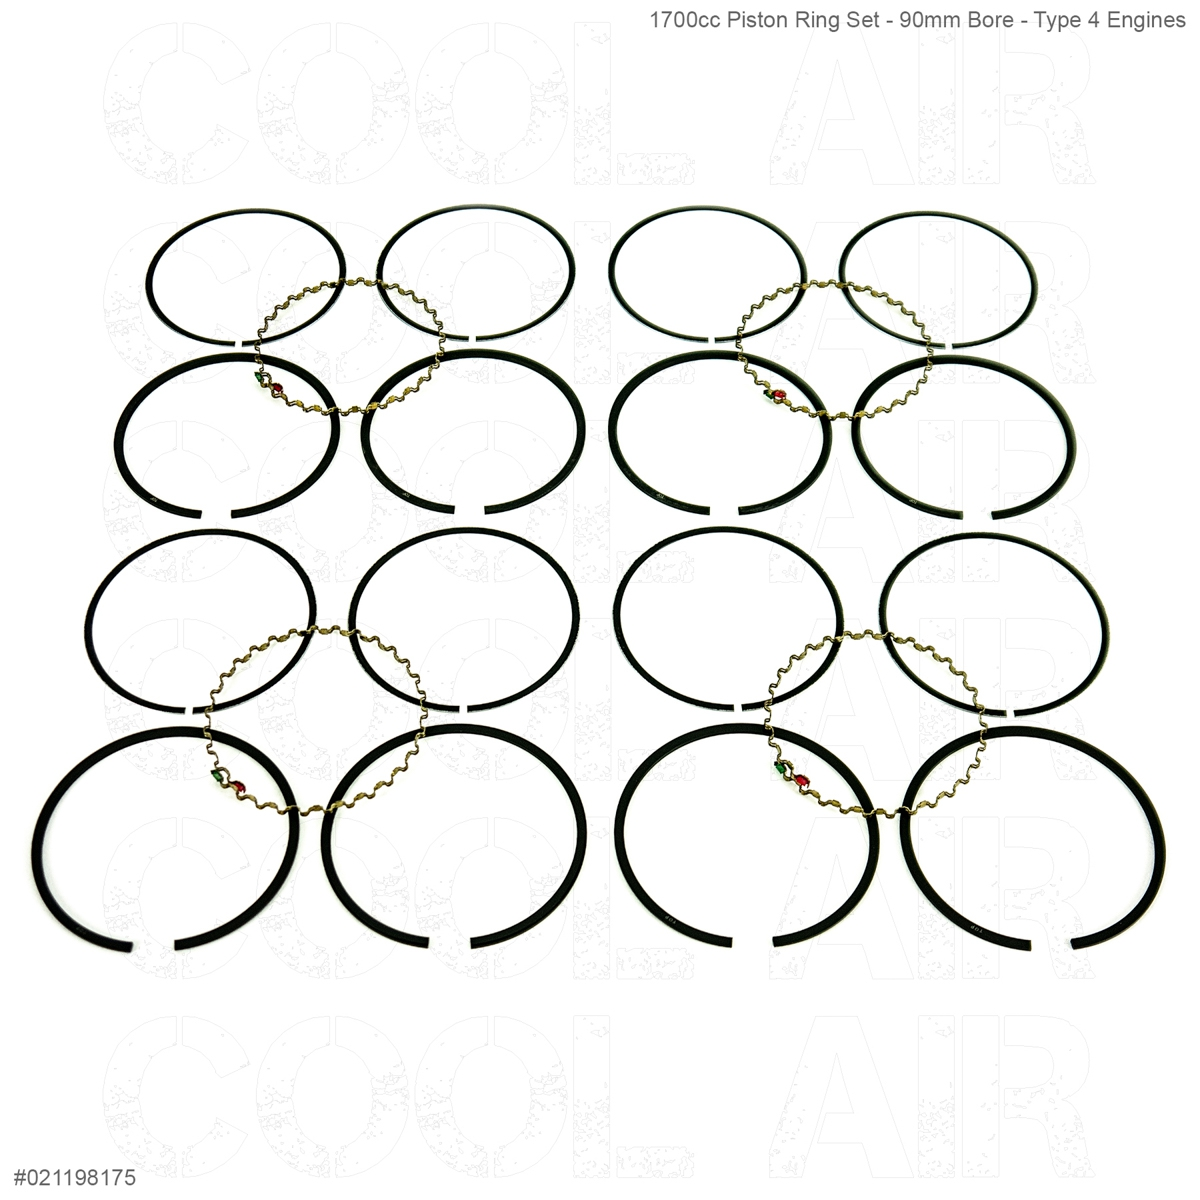 1700cc Piston Ring Set - 90mm Bore - Type 4 Engines